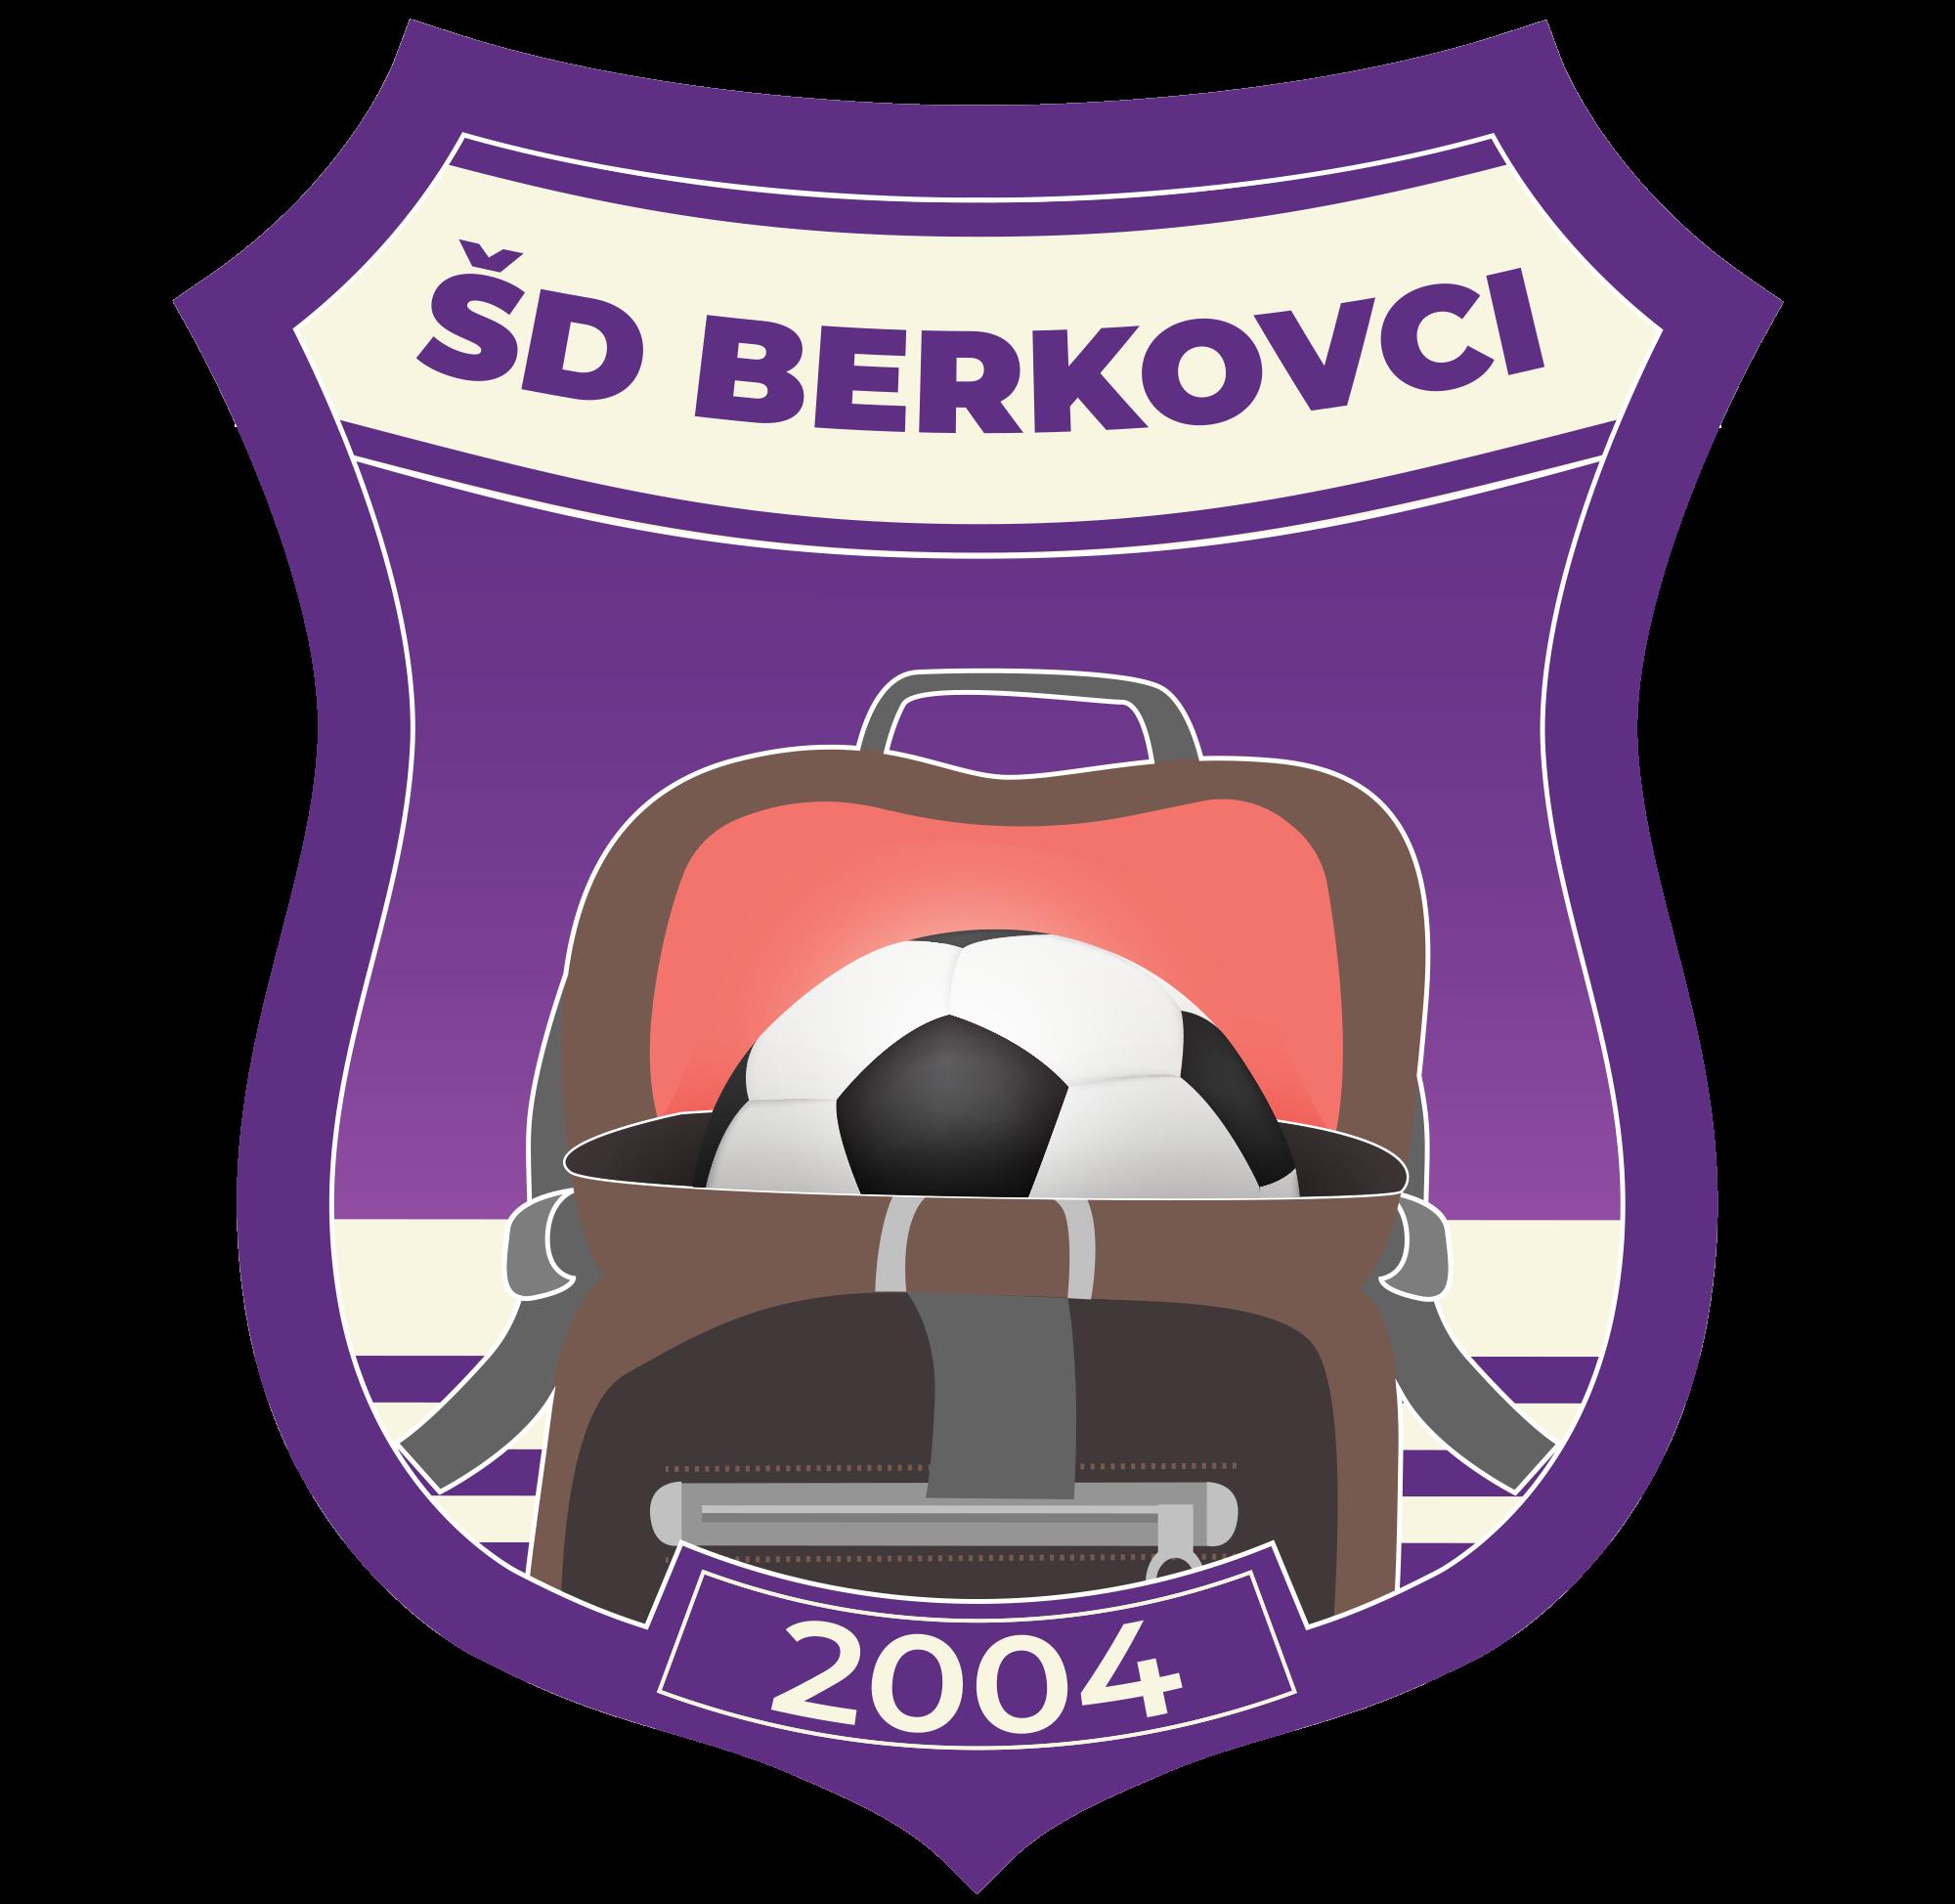 Športno društvo Berkovci – since 2004